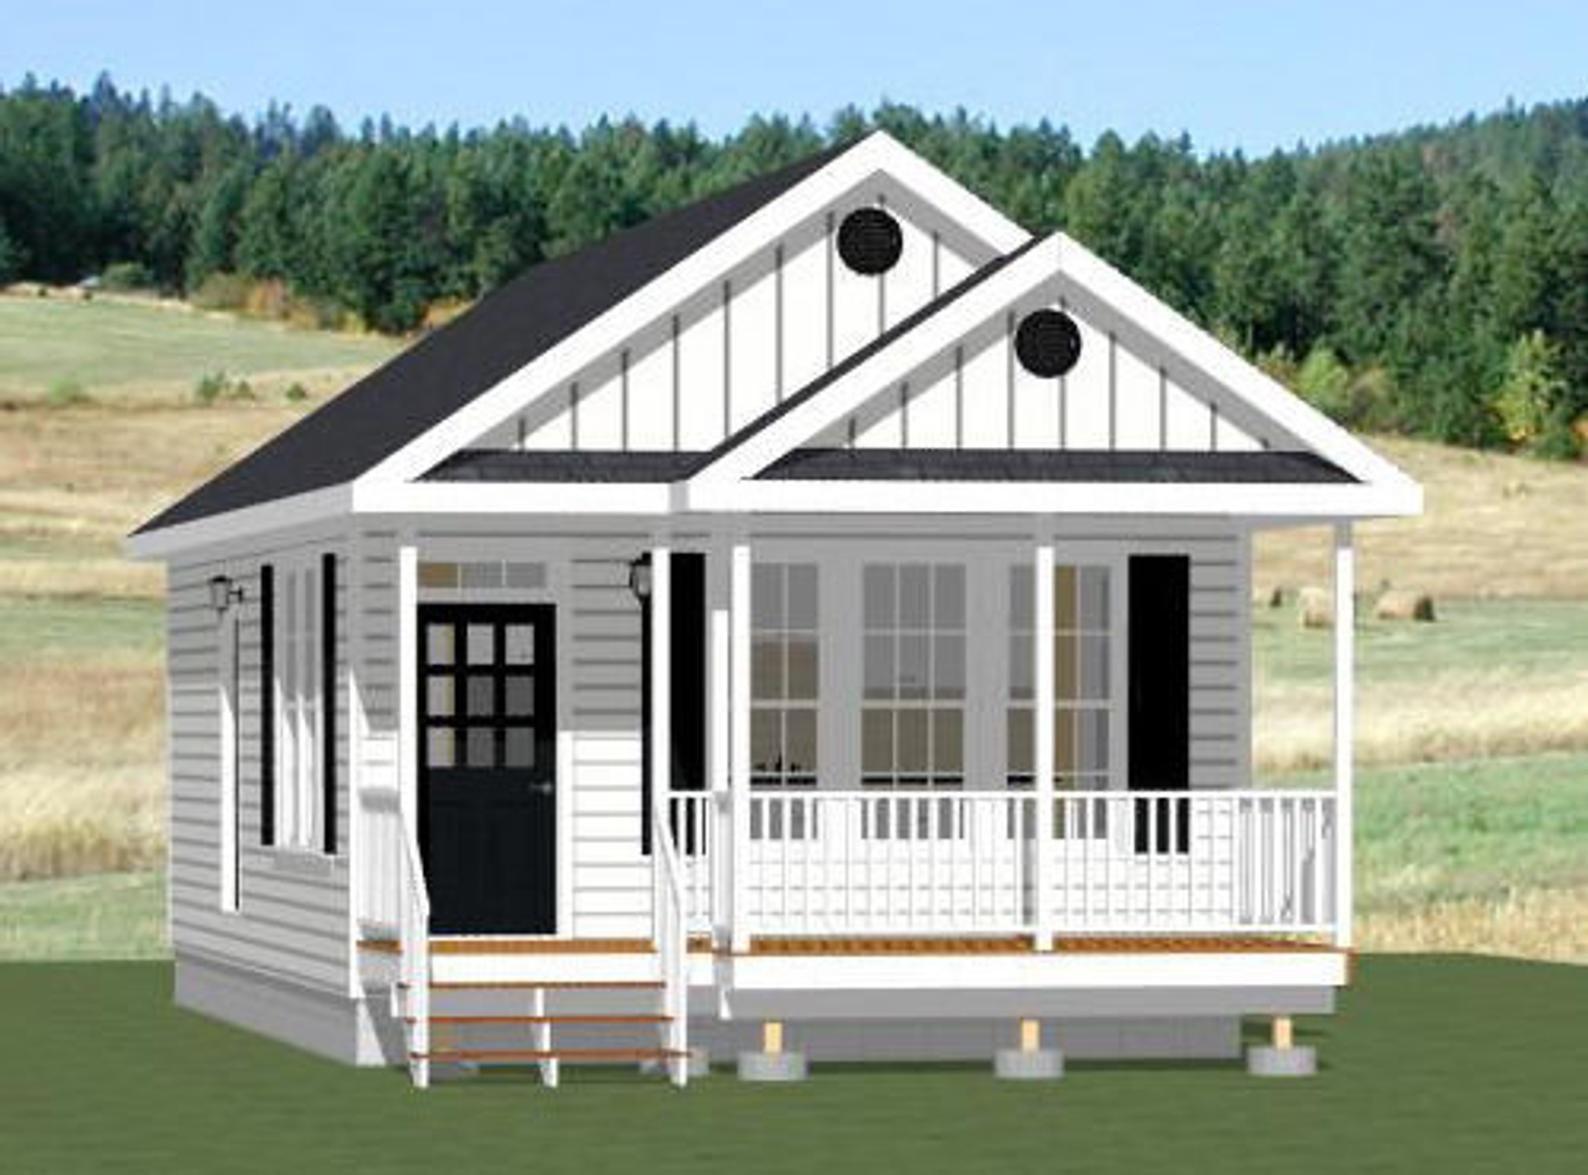 18x32 House 1 Bedroom 1 Bath 576 Sq Ft Pdf Floor Plan Etsy In 2020 Cottage House Plans Tiny House Floor Plans Cabin House Plans